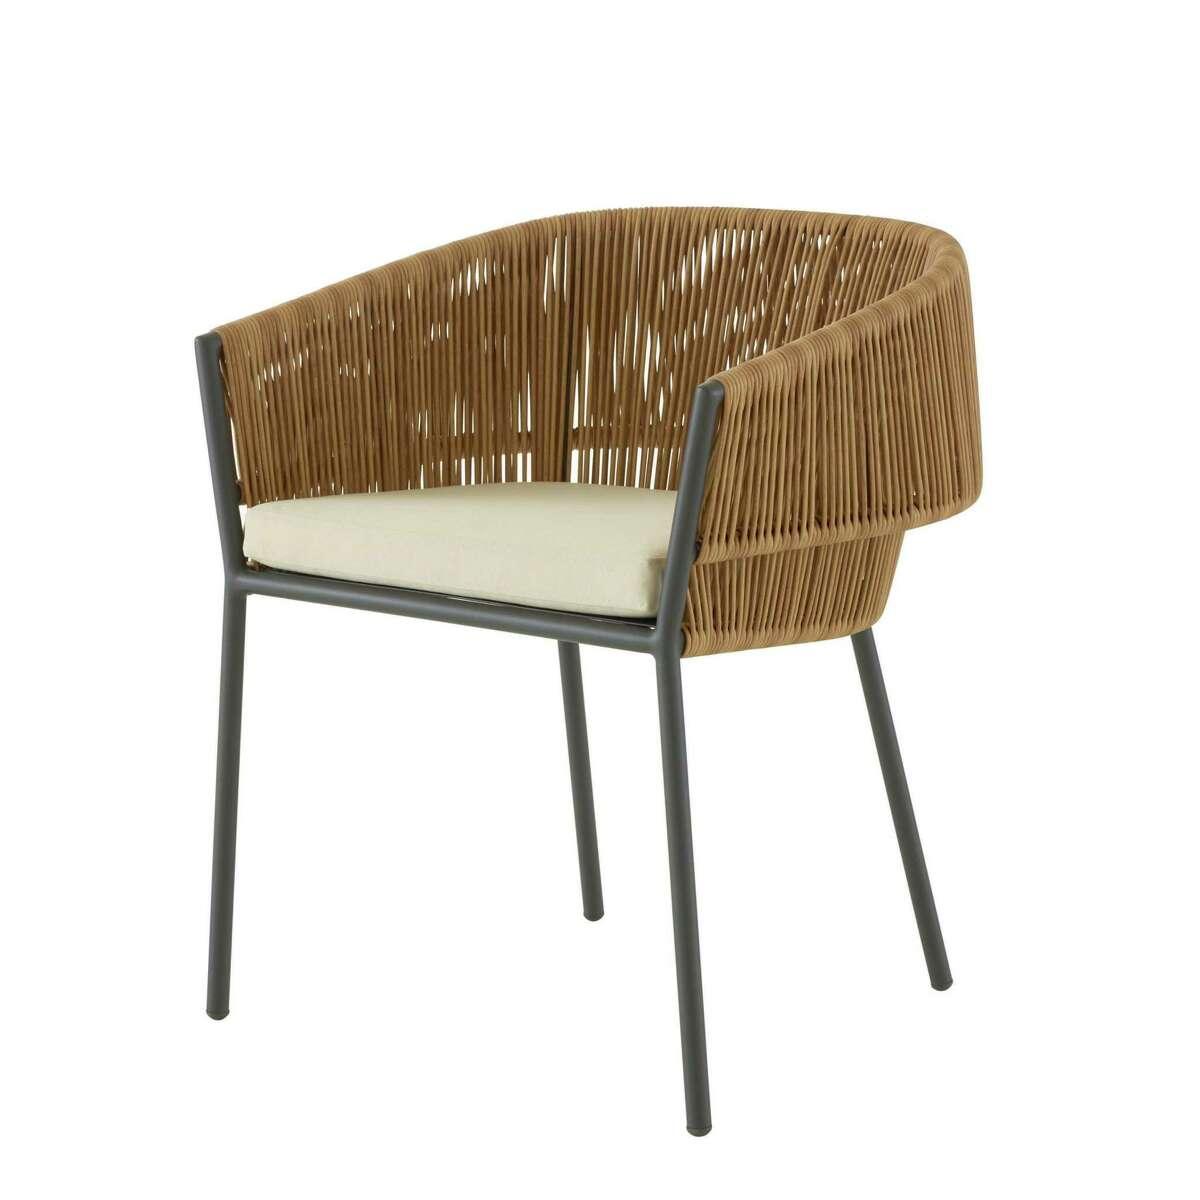 Busetti Garuti Redaelli's Lapel outdoor chair, $870 and up.